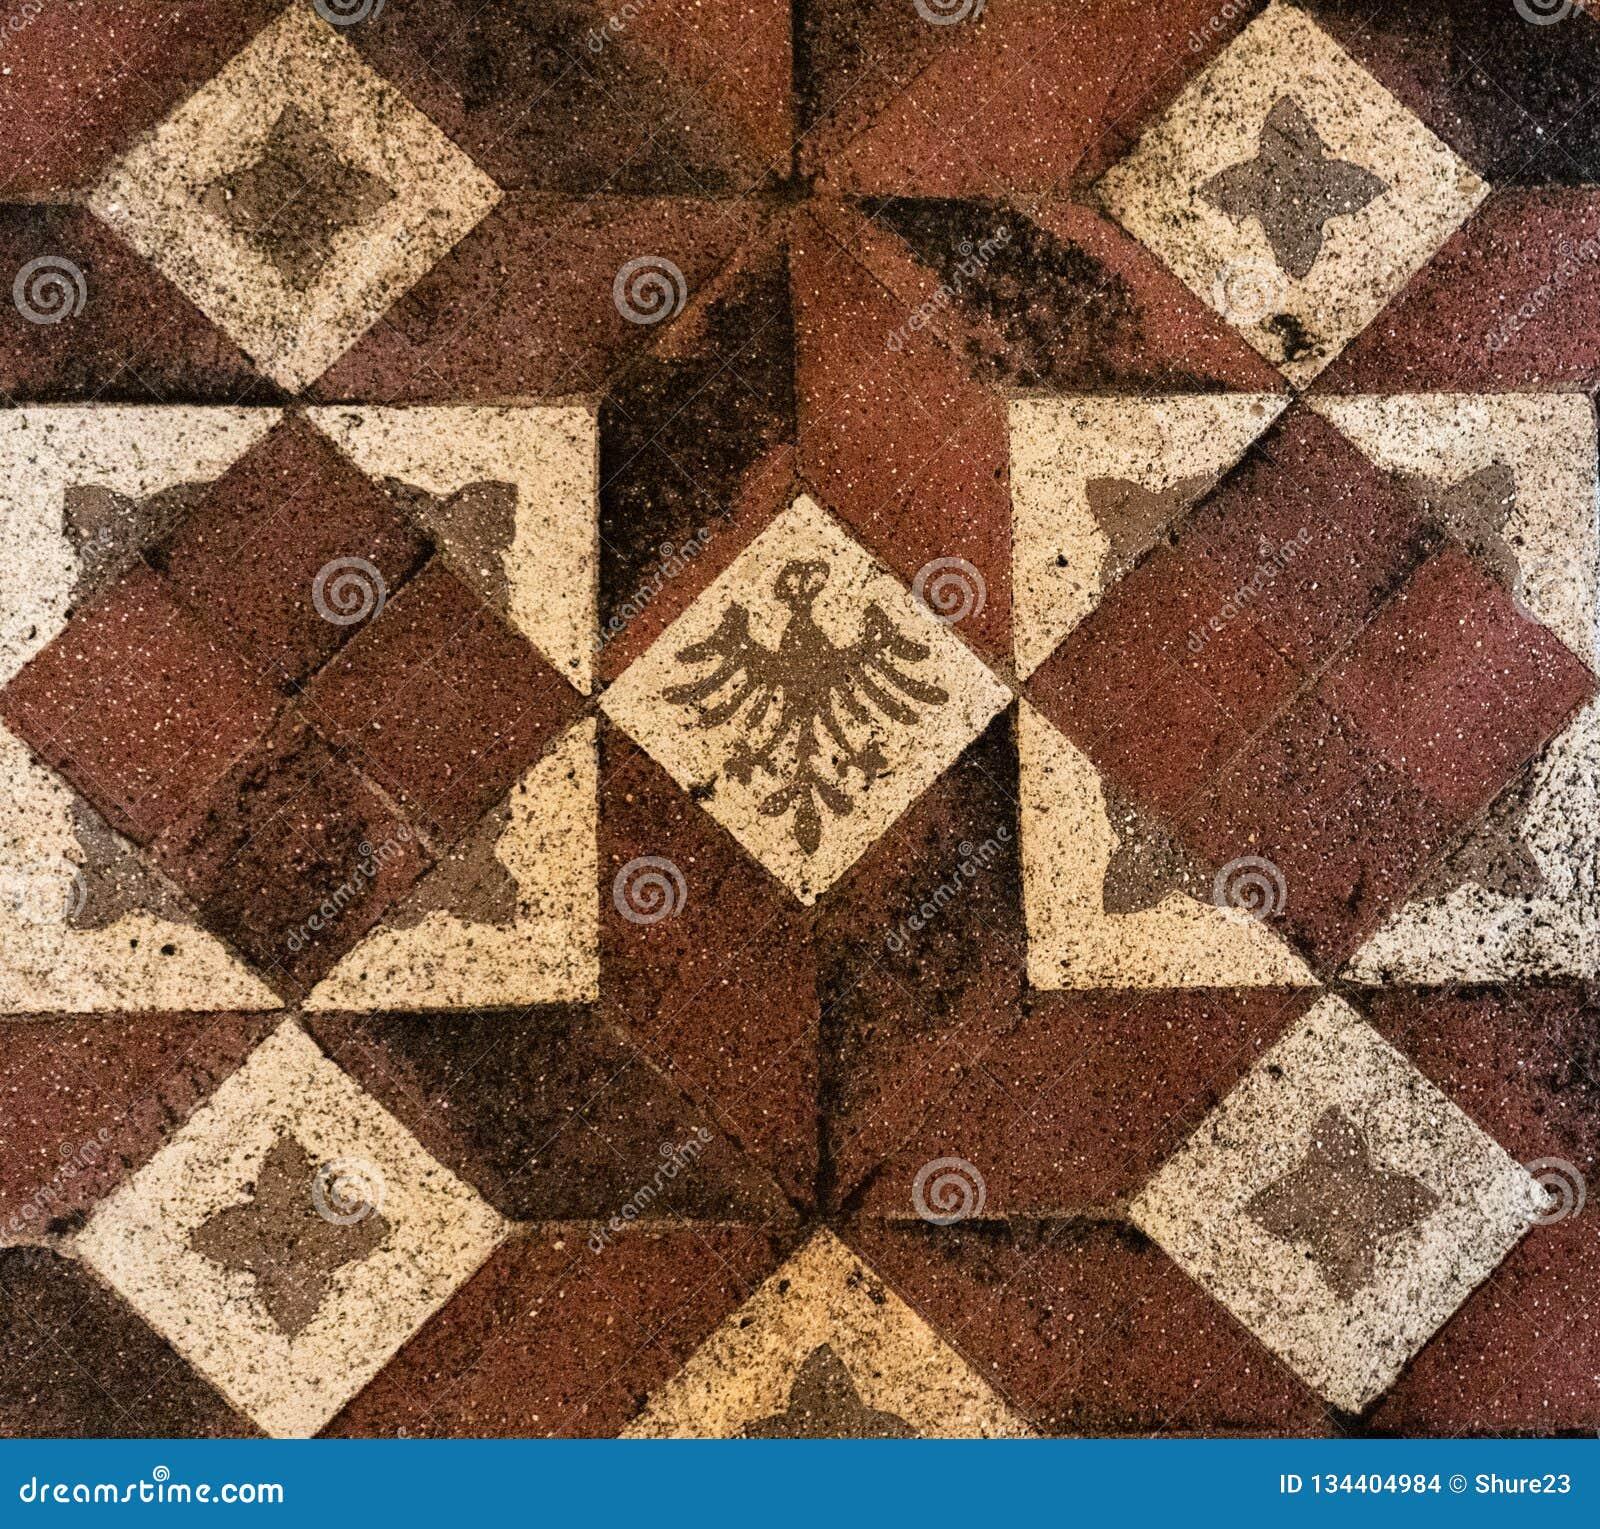 Old Medieval Floor Tiles Pattern Texture